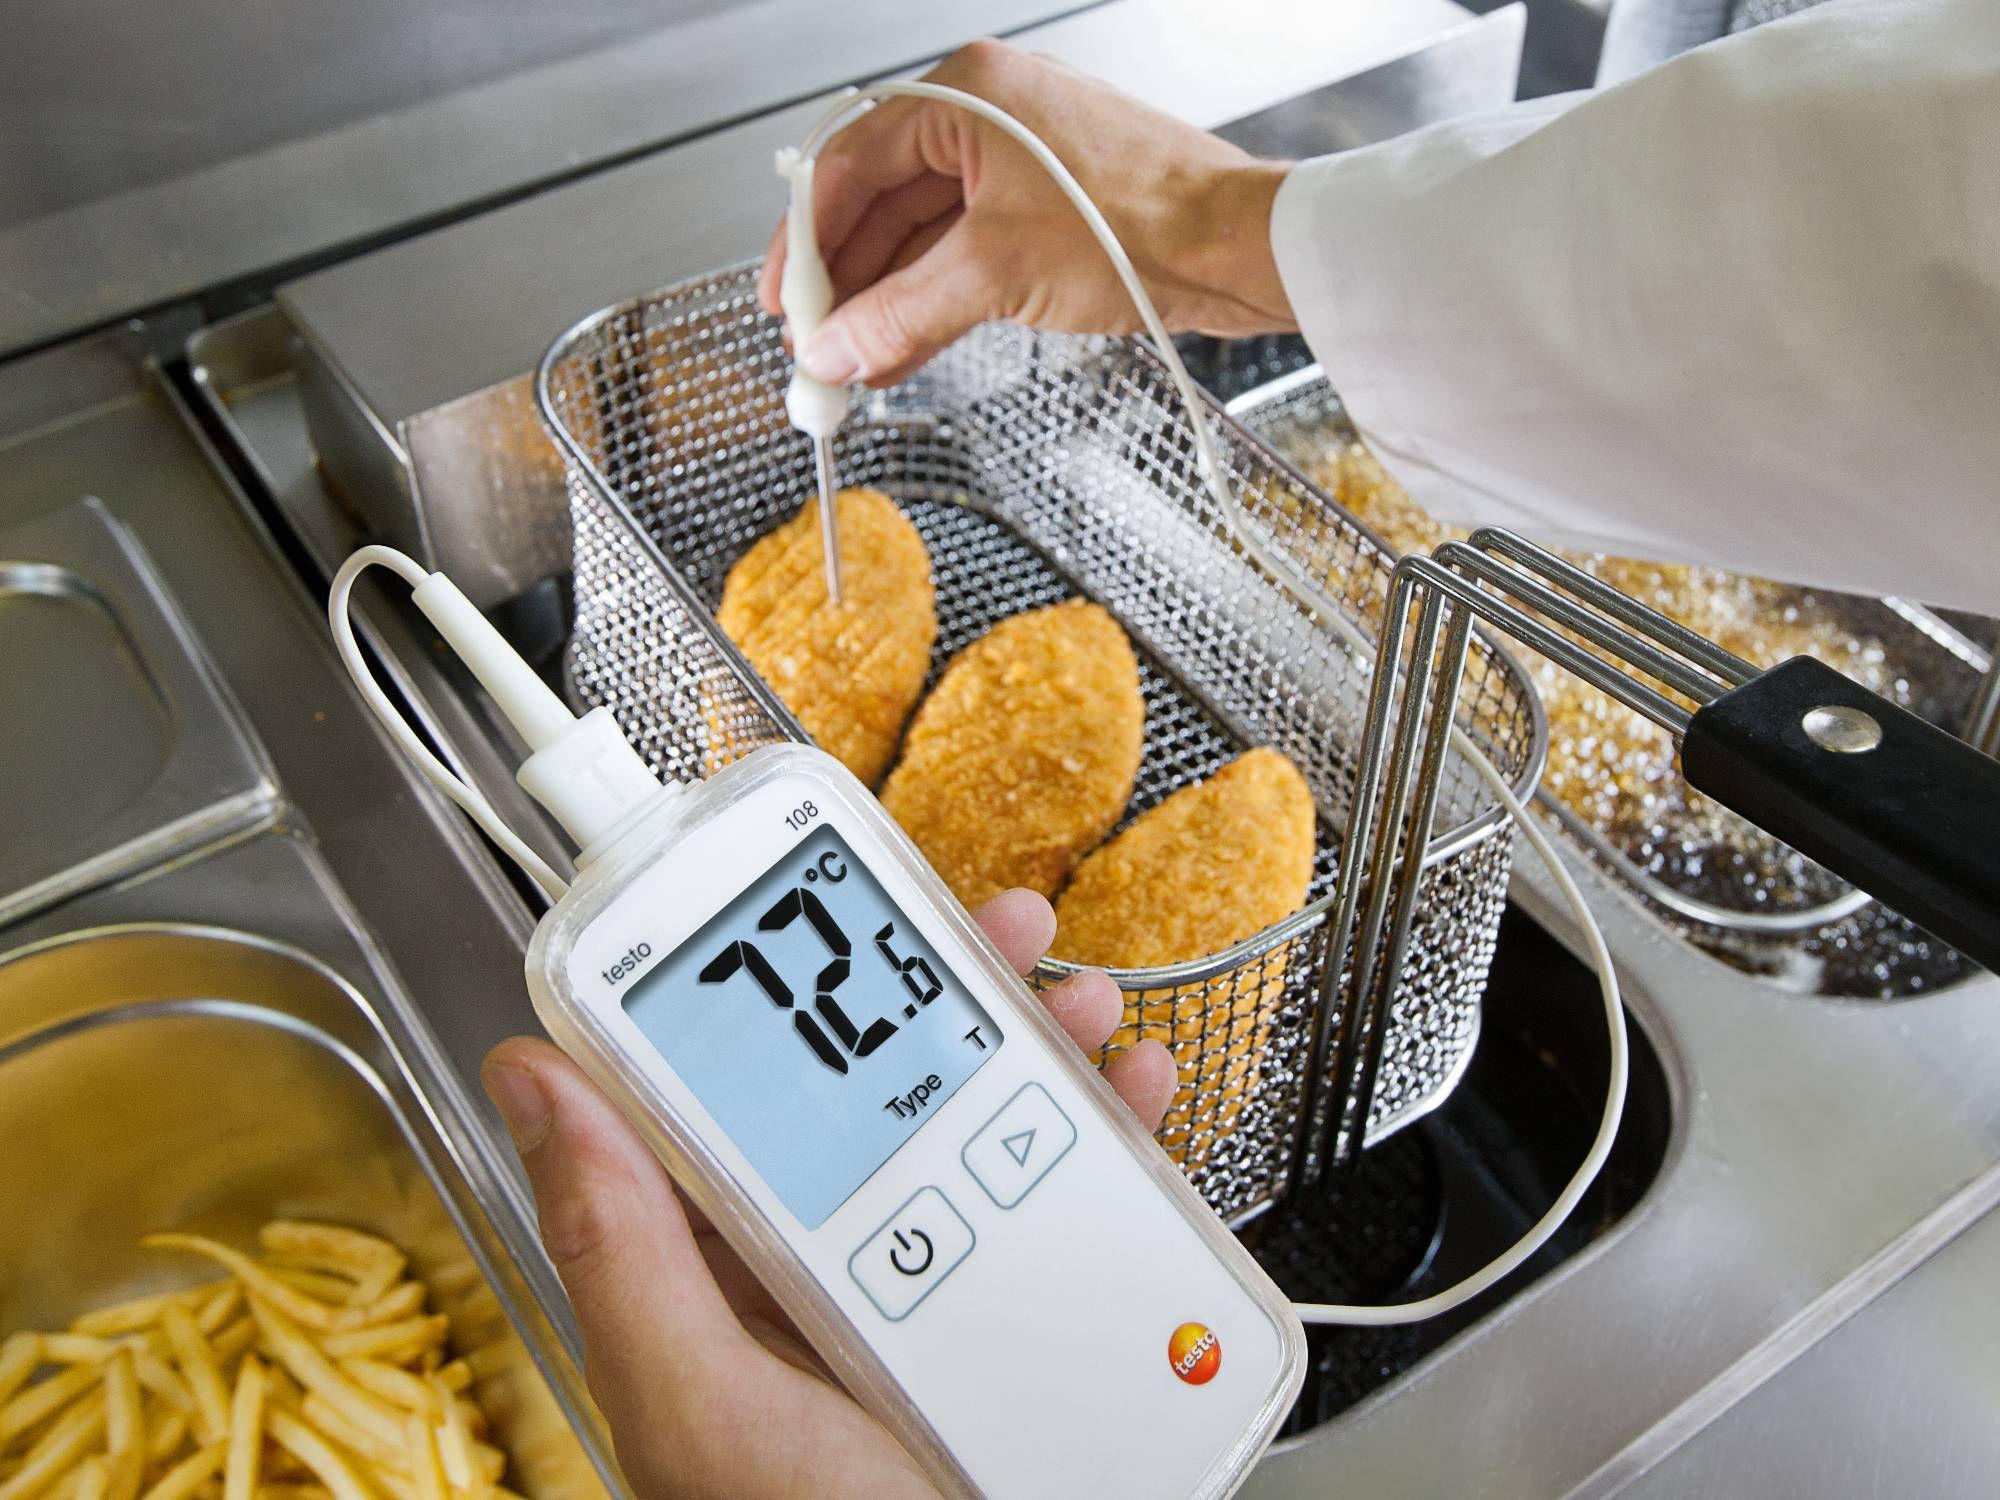 Temperature measuring instruments for food preparation